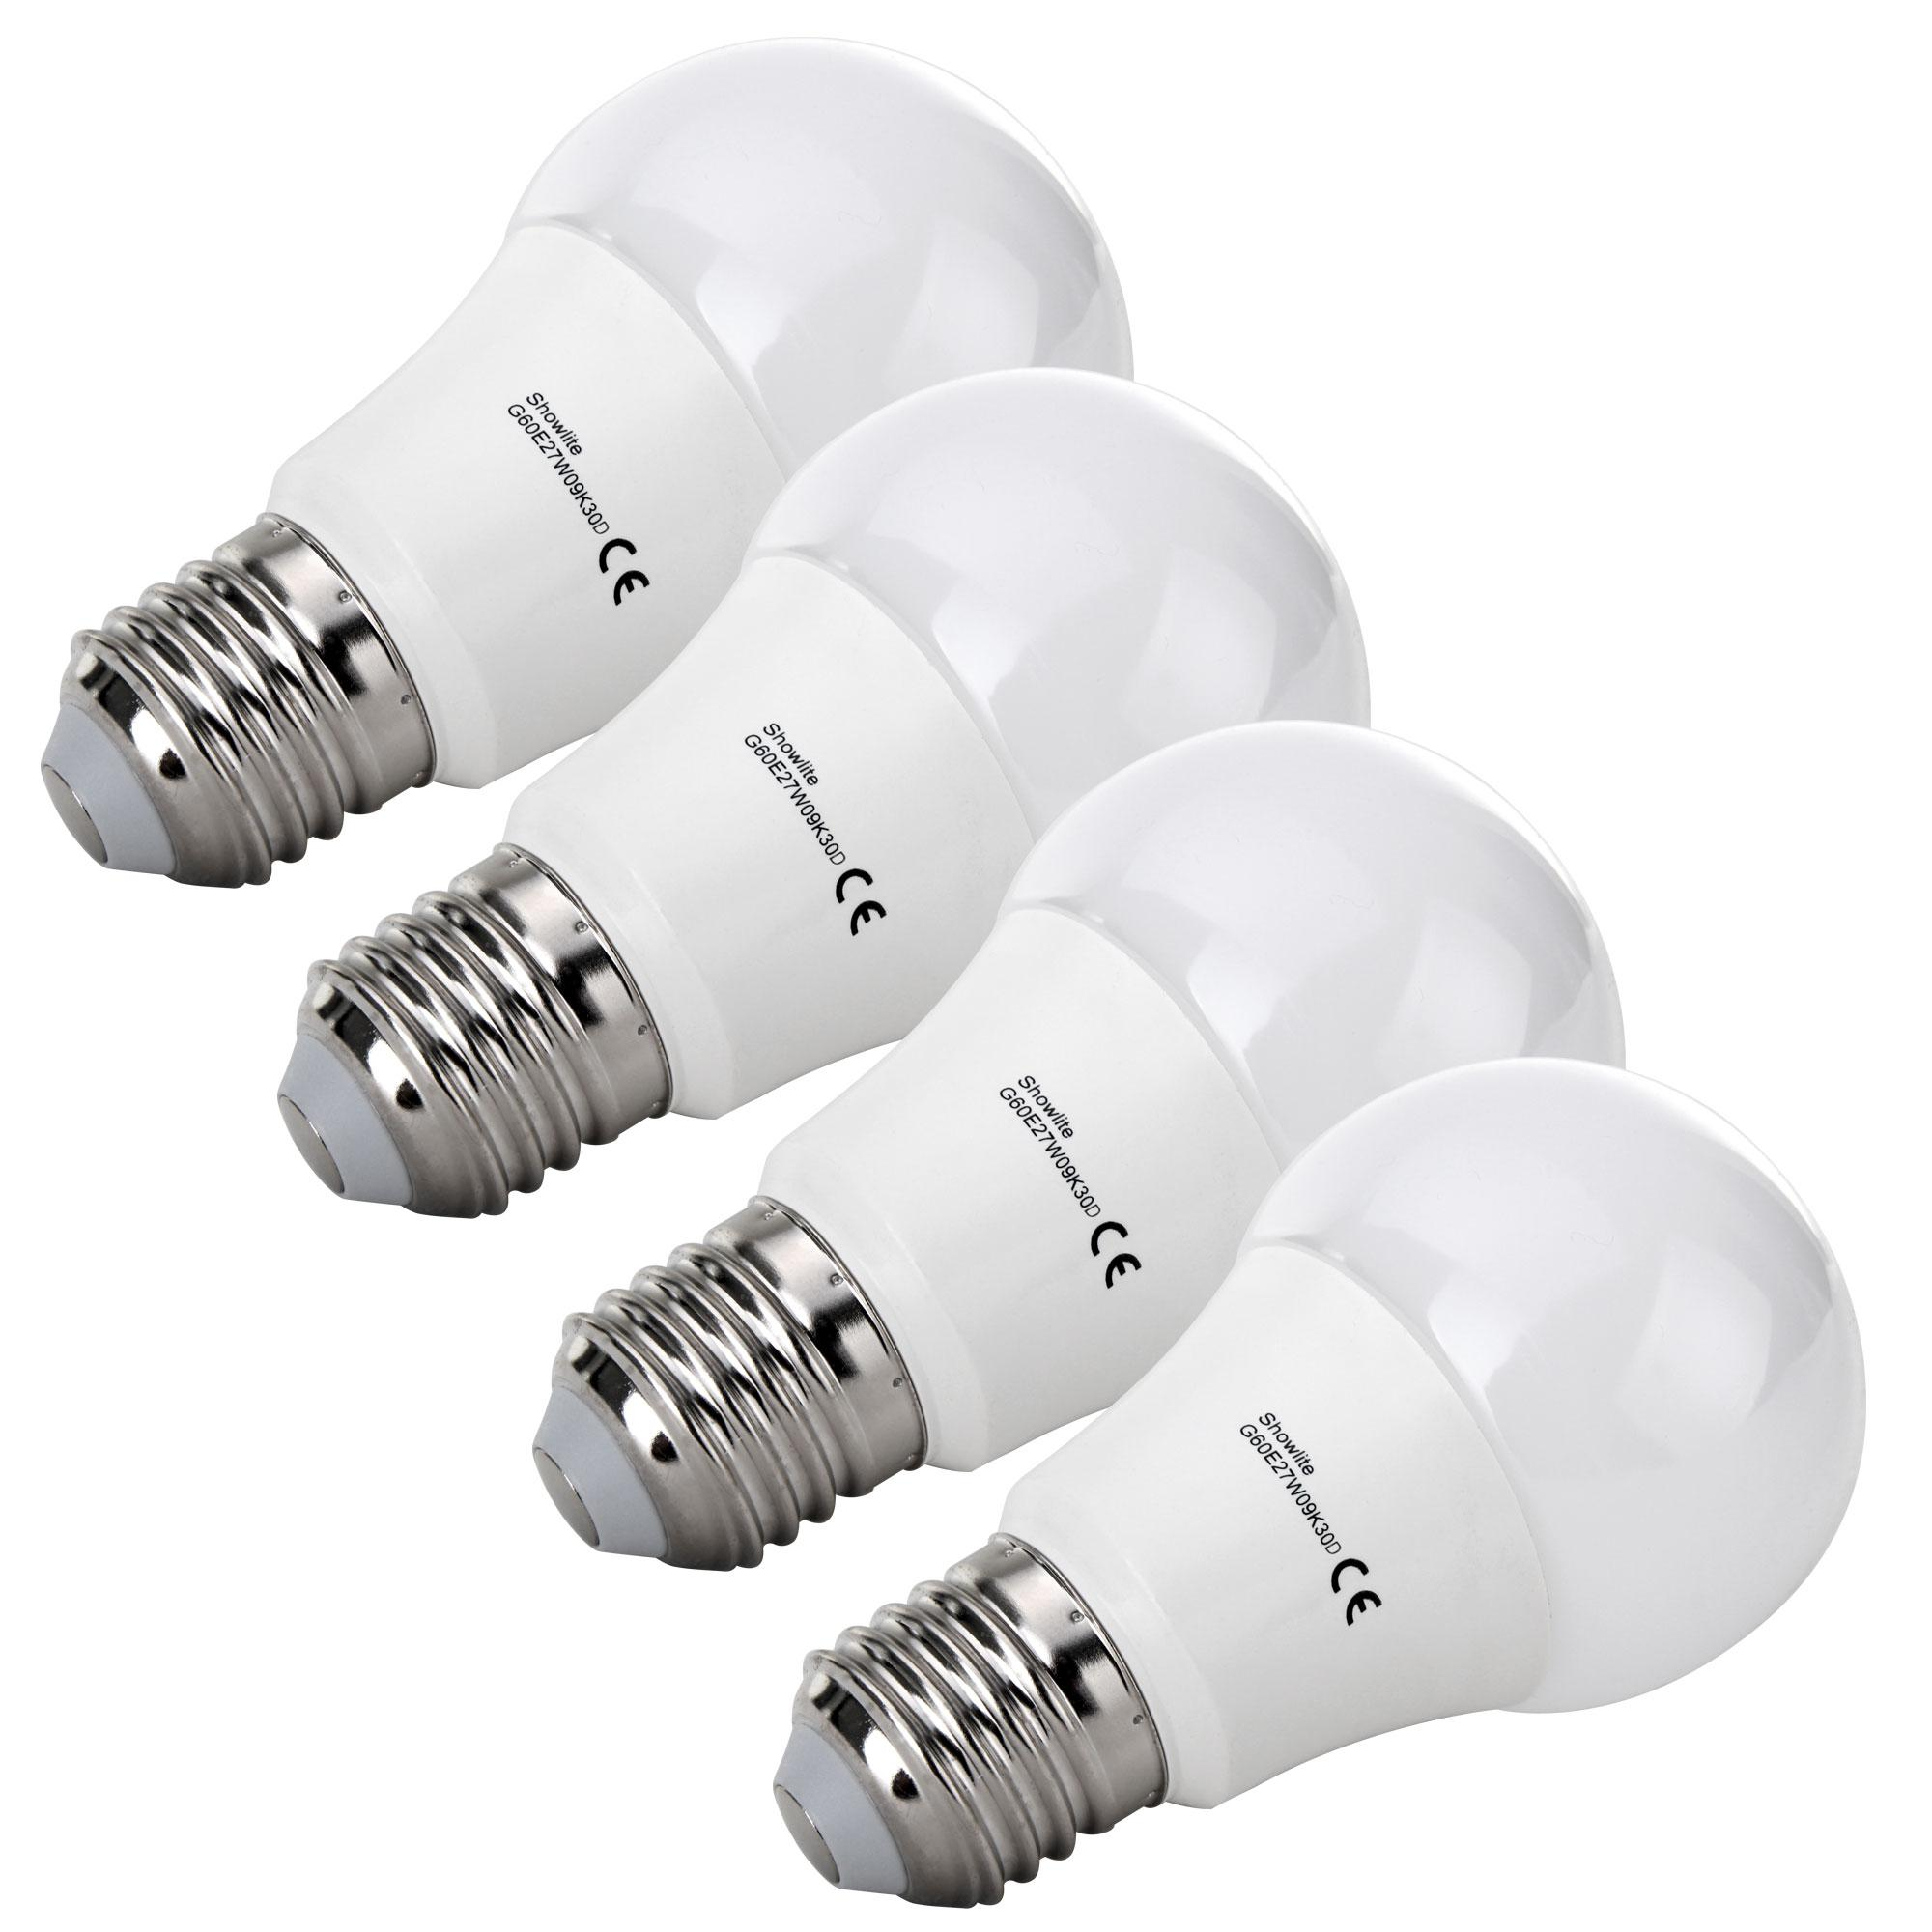 four piece set showlite led bulb g60e27w09k30d 9 watt 860. Black Bedroom Furniture Sets. Home Design Ideas